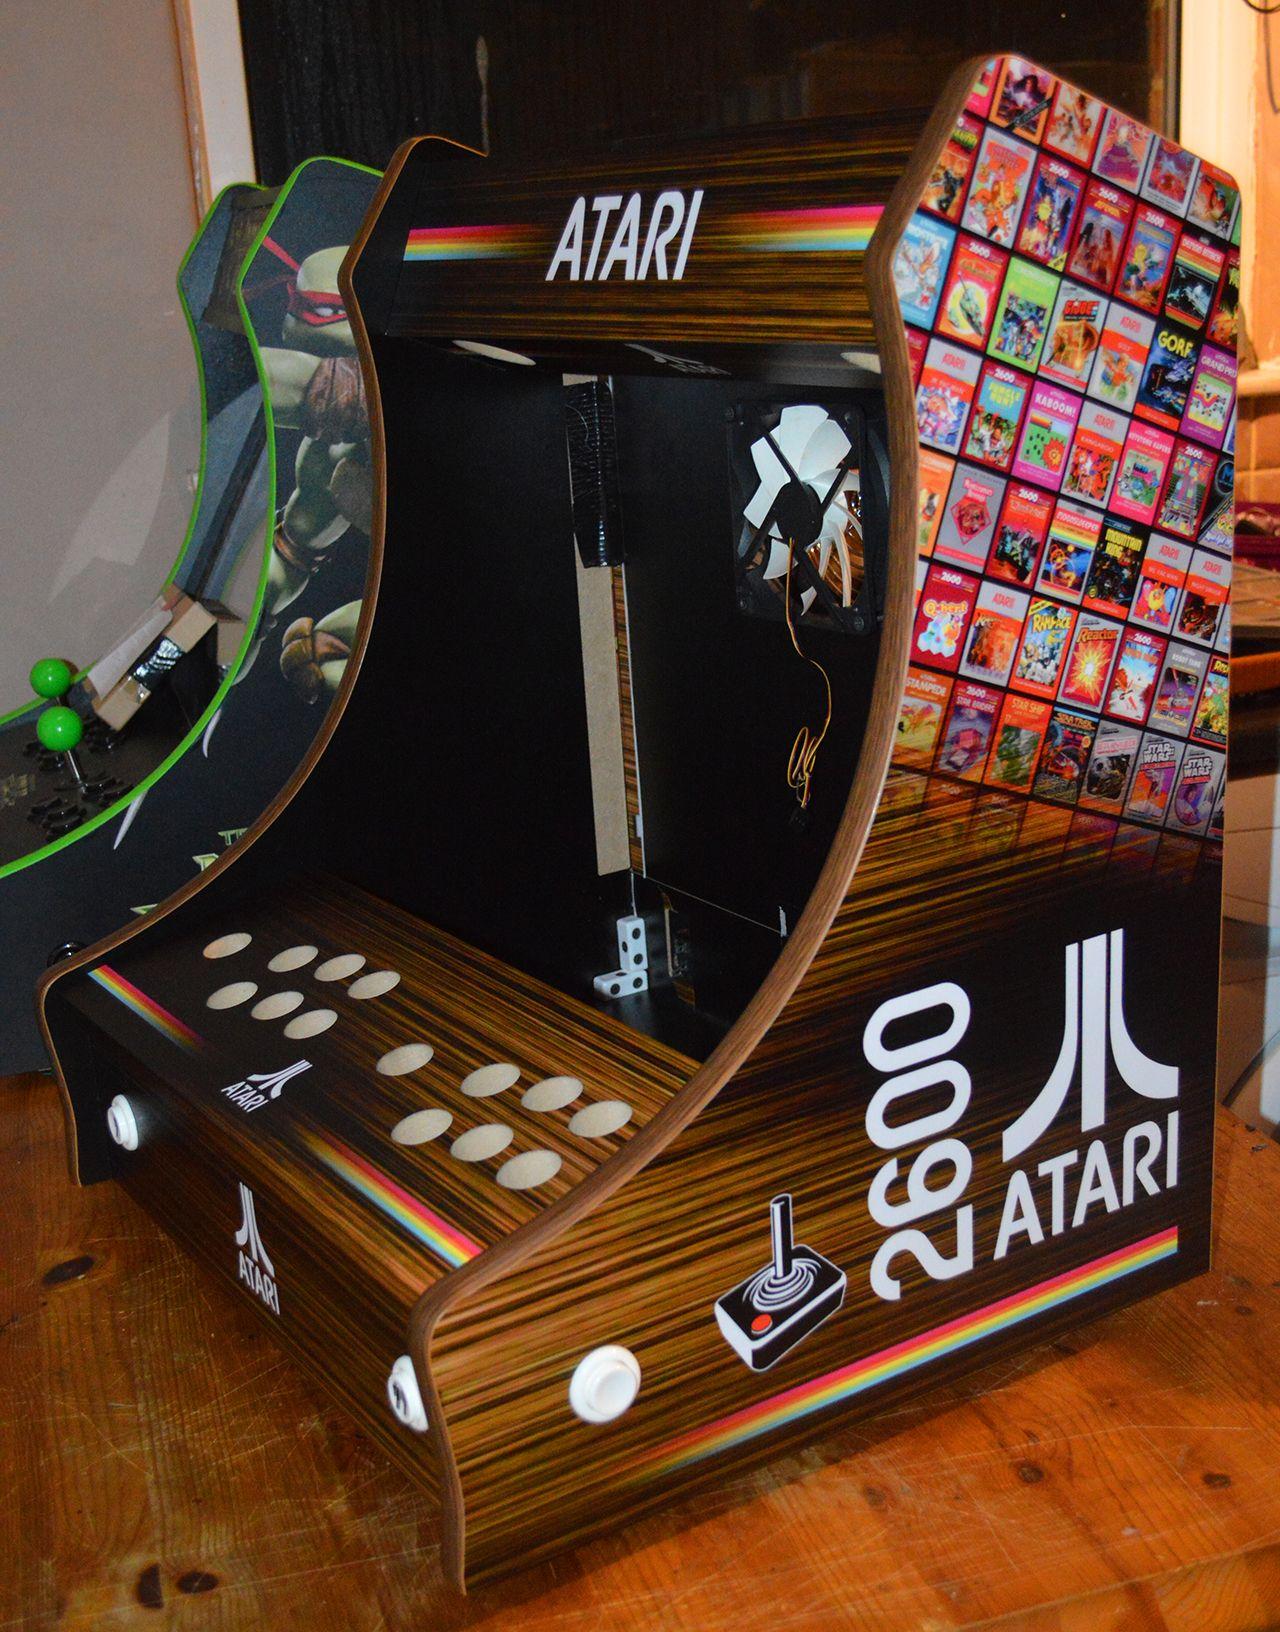 pingl par romain sautreuil sur geek bartop arcade. Black Bedroom Furniture Sets. Home Design Ideas